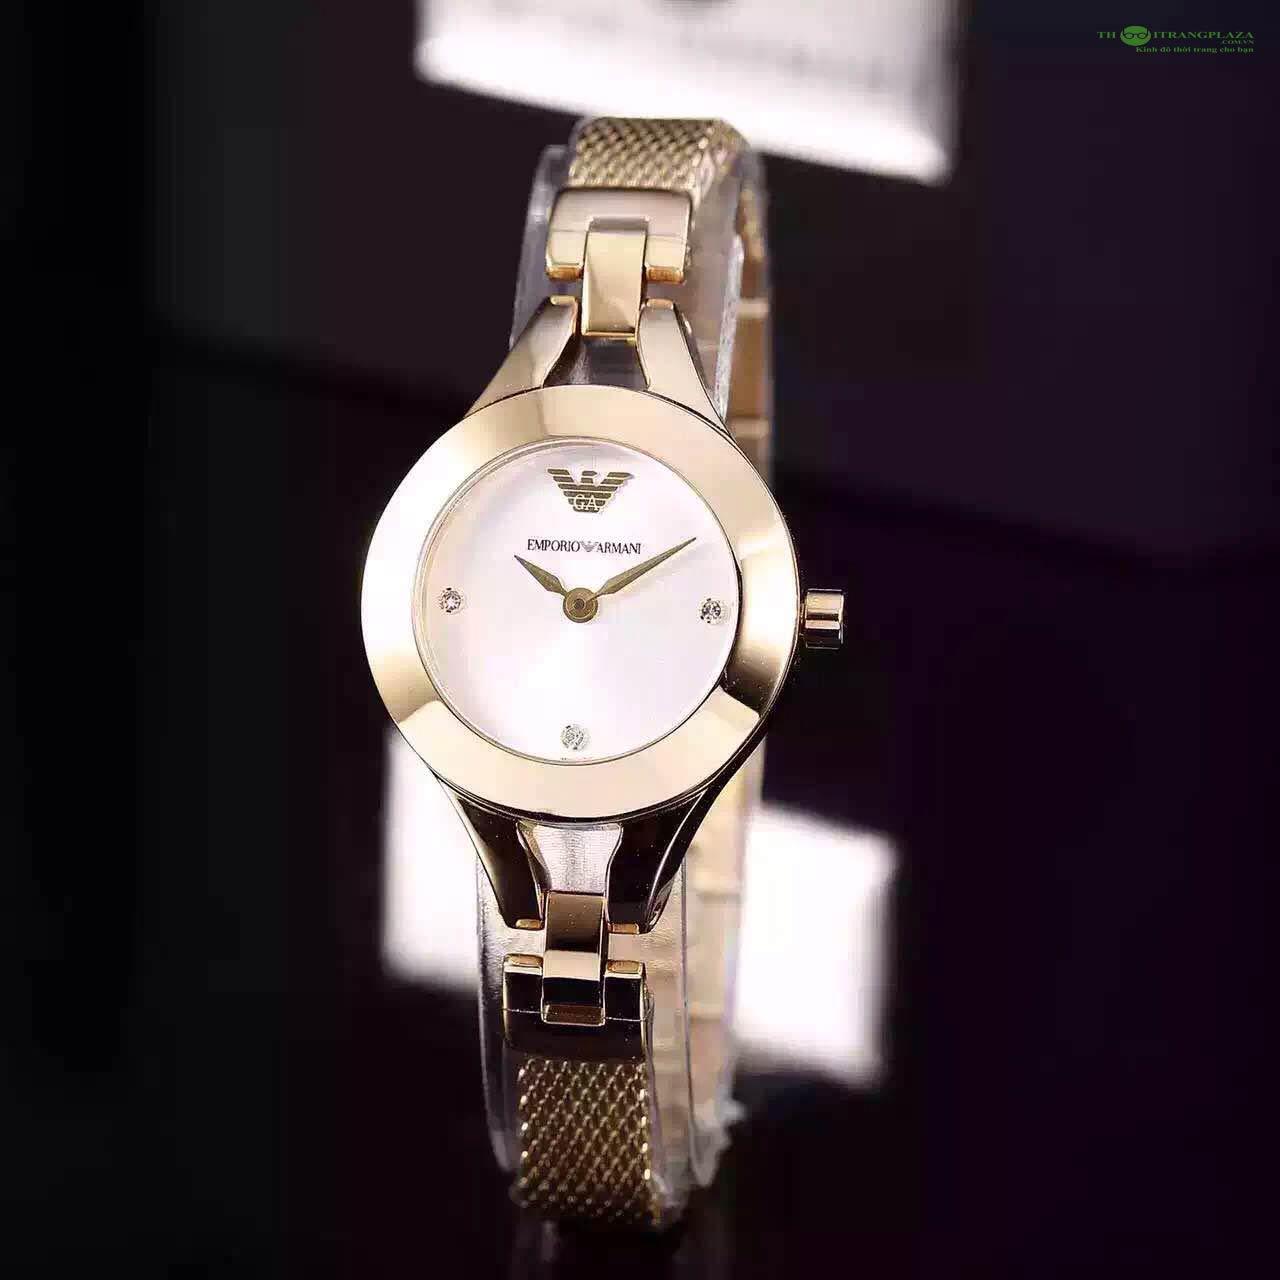 Đồng hồ nữ thời trang cao cấp Armani AR7362